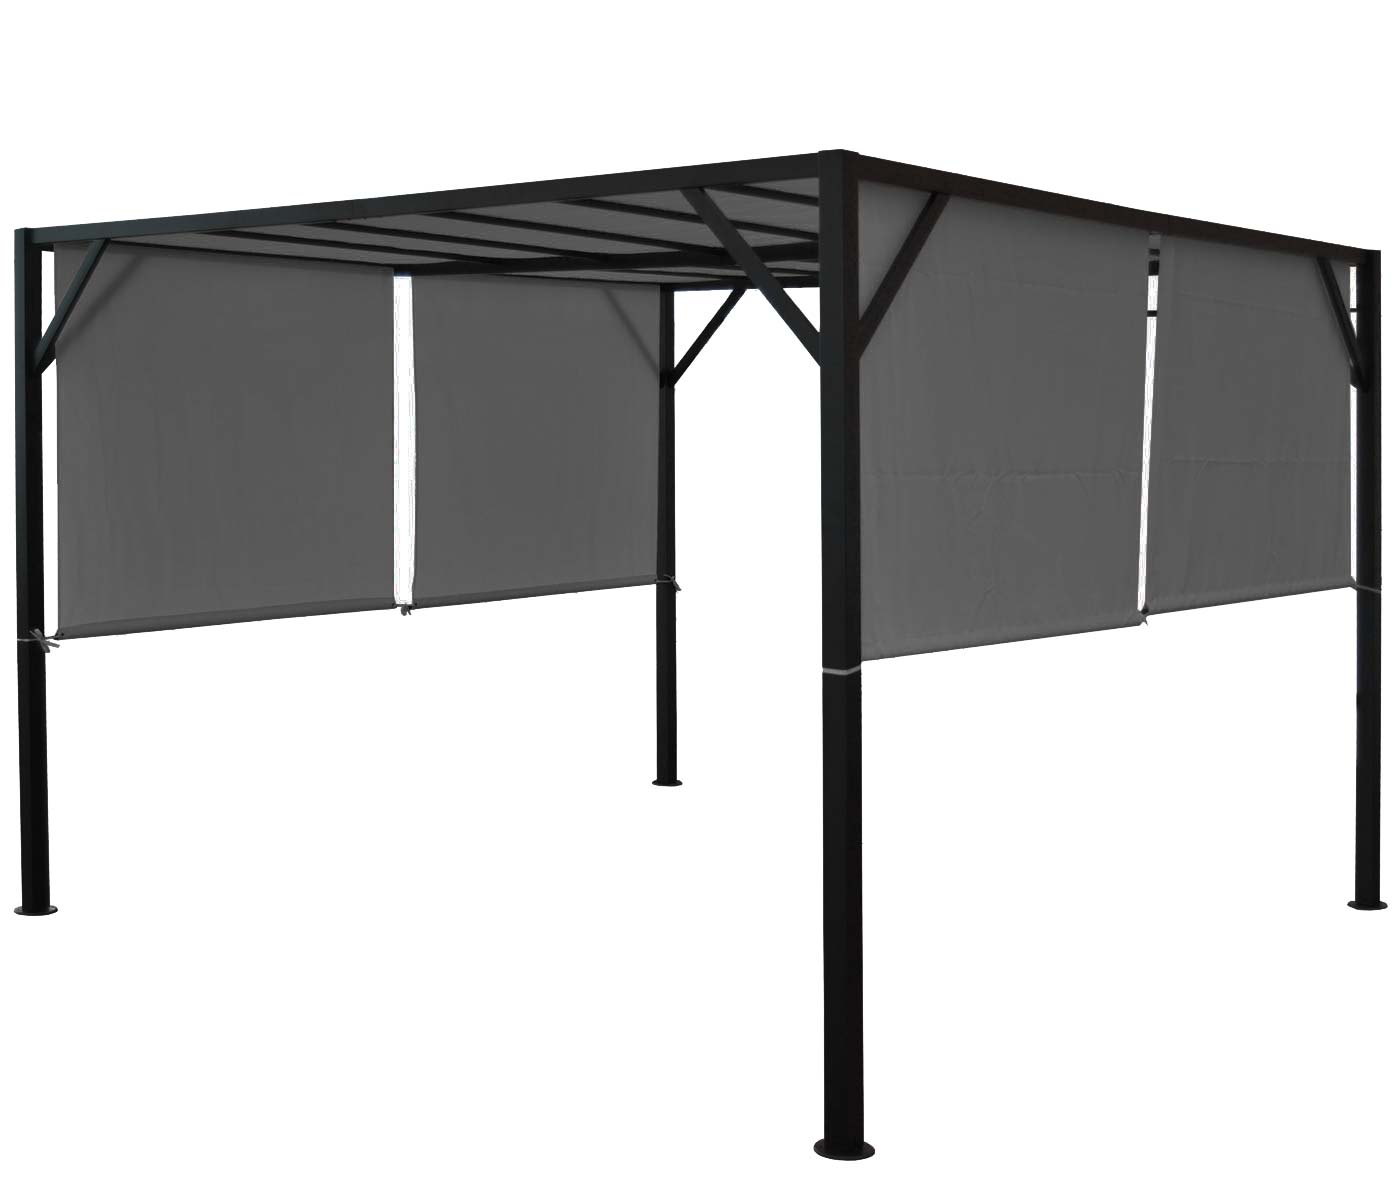 Pergola Baia, Garten Pavillon Terrassenüberdachung, stabiles 6cm-Stahl-Gestell + Schiebedach grau - 4x4m